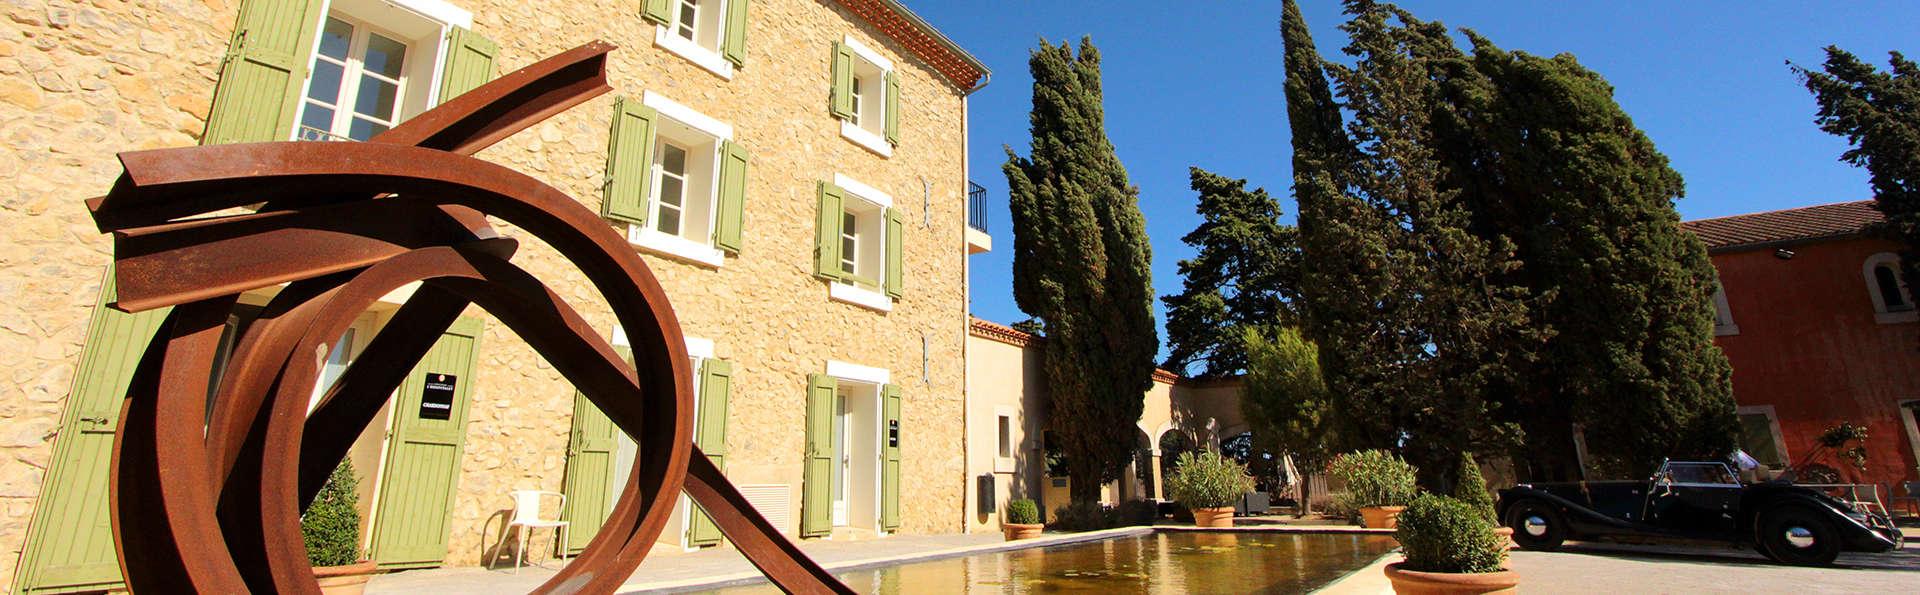 Château l'Hospitalet  - Edit_Garden.jpg